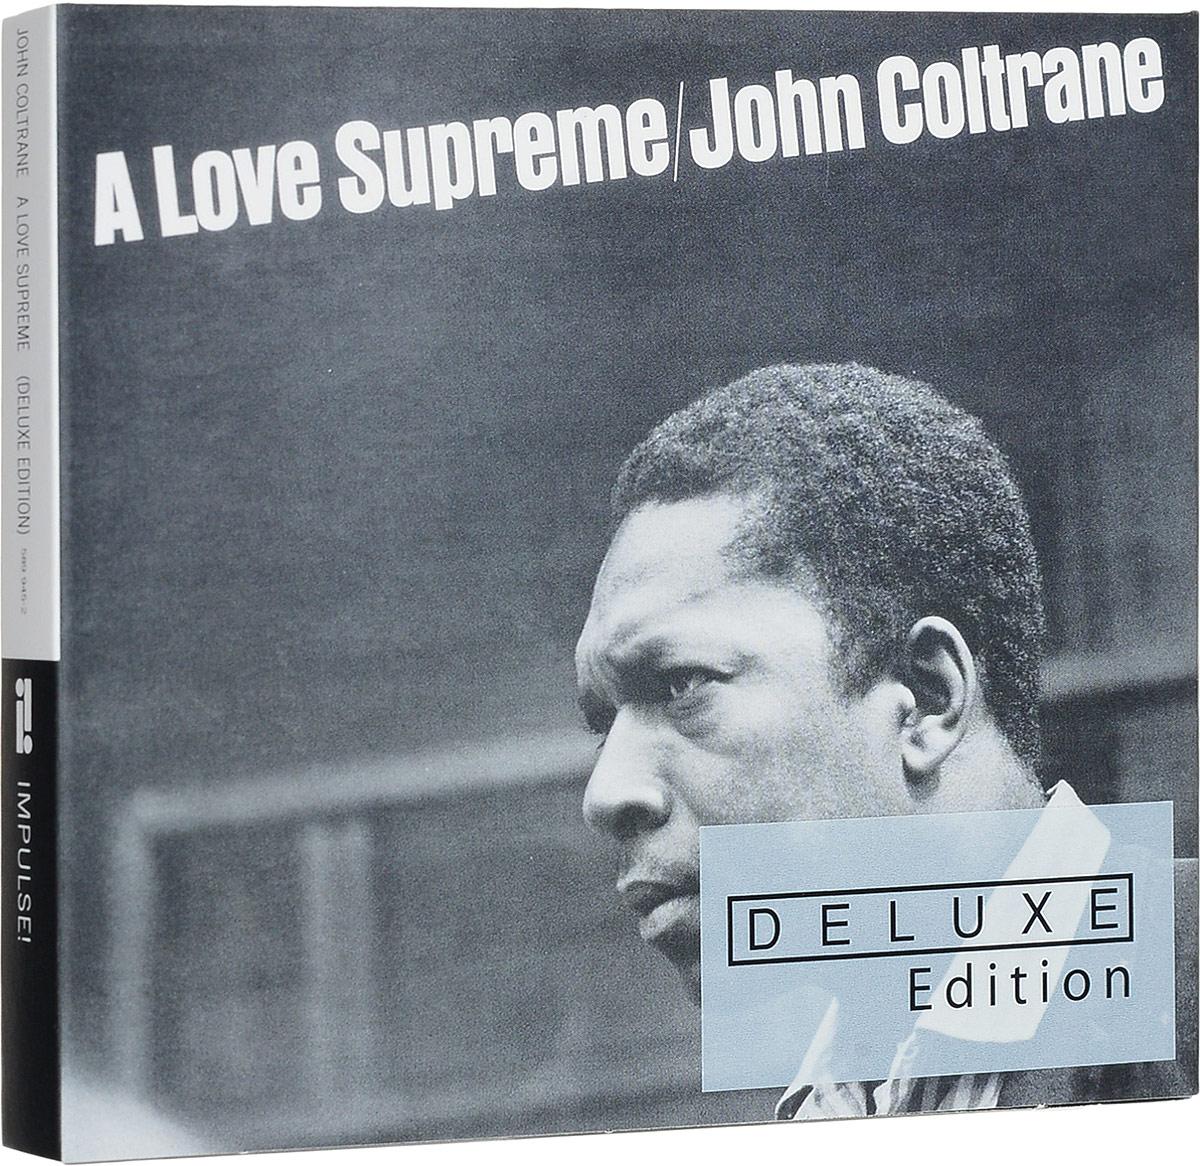 Джон Колтрейн John Coltrane. A Love Supreme (Deluxe Edition) (2 CD) джон колтрейн john coltrane giant steps the best of the early years 10 cd